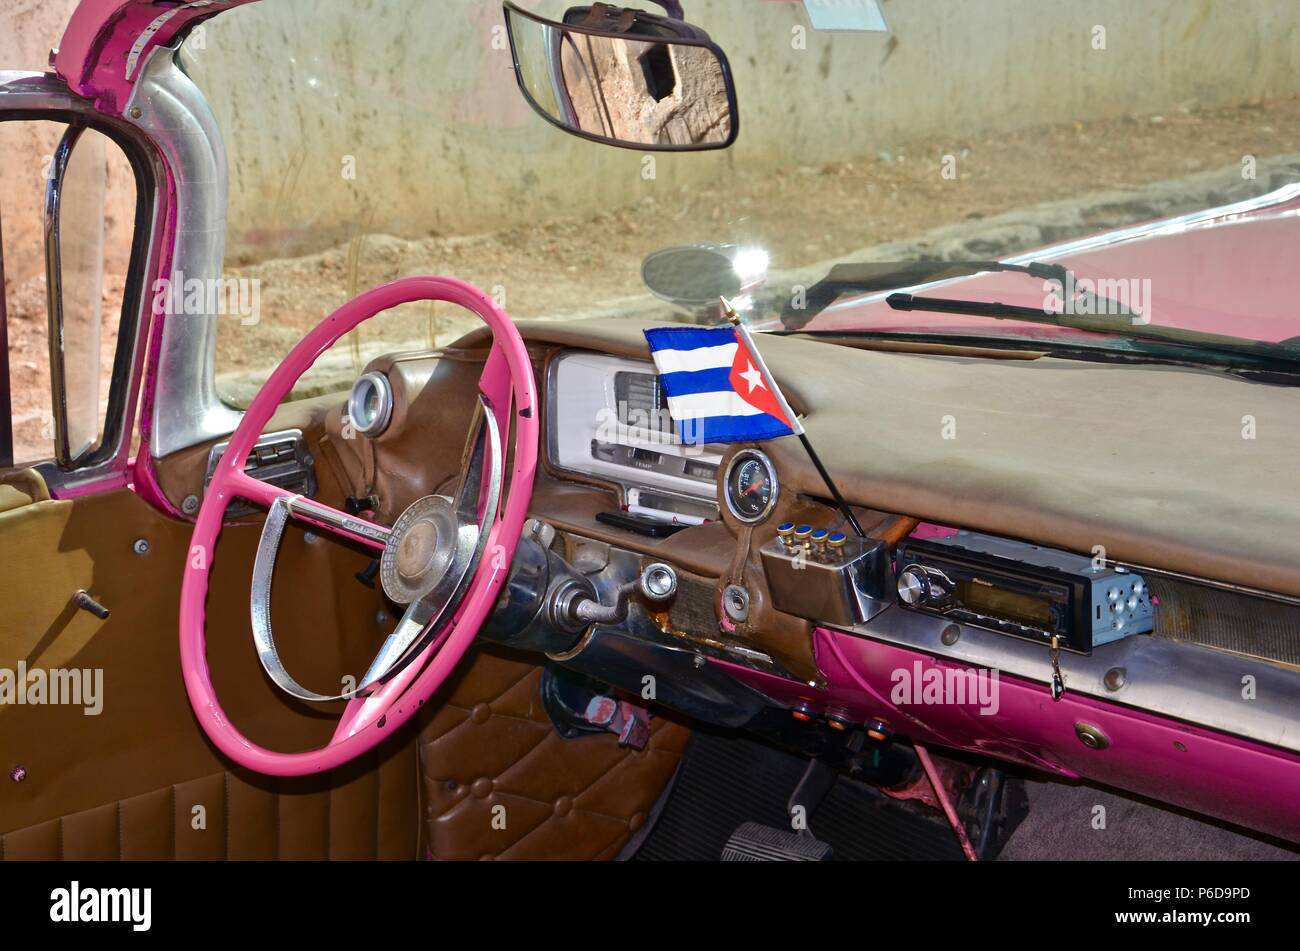 Interieur einer rosa Oldtimer in Havanna, Kuba, alt, Flagge, Straße, Verkehr, Taxi, Tourismus, Karibik, amerikanische, Fahrzeug, Spiegel, rosa Lenkrad Stockbild